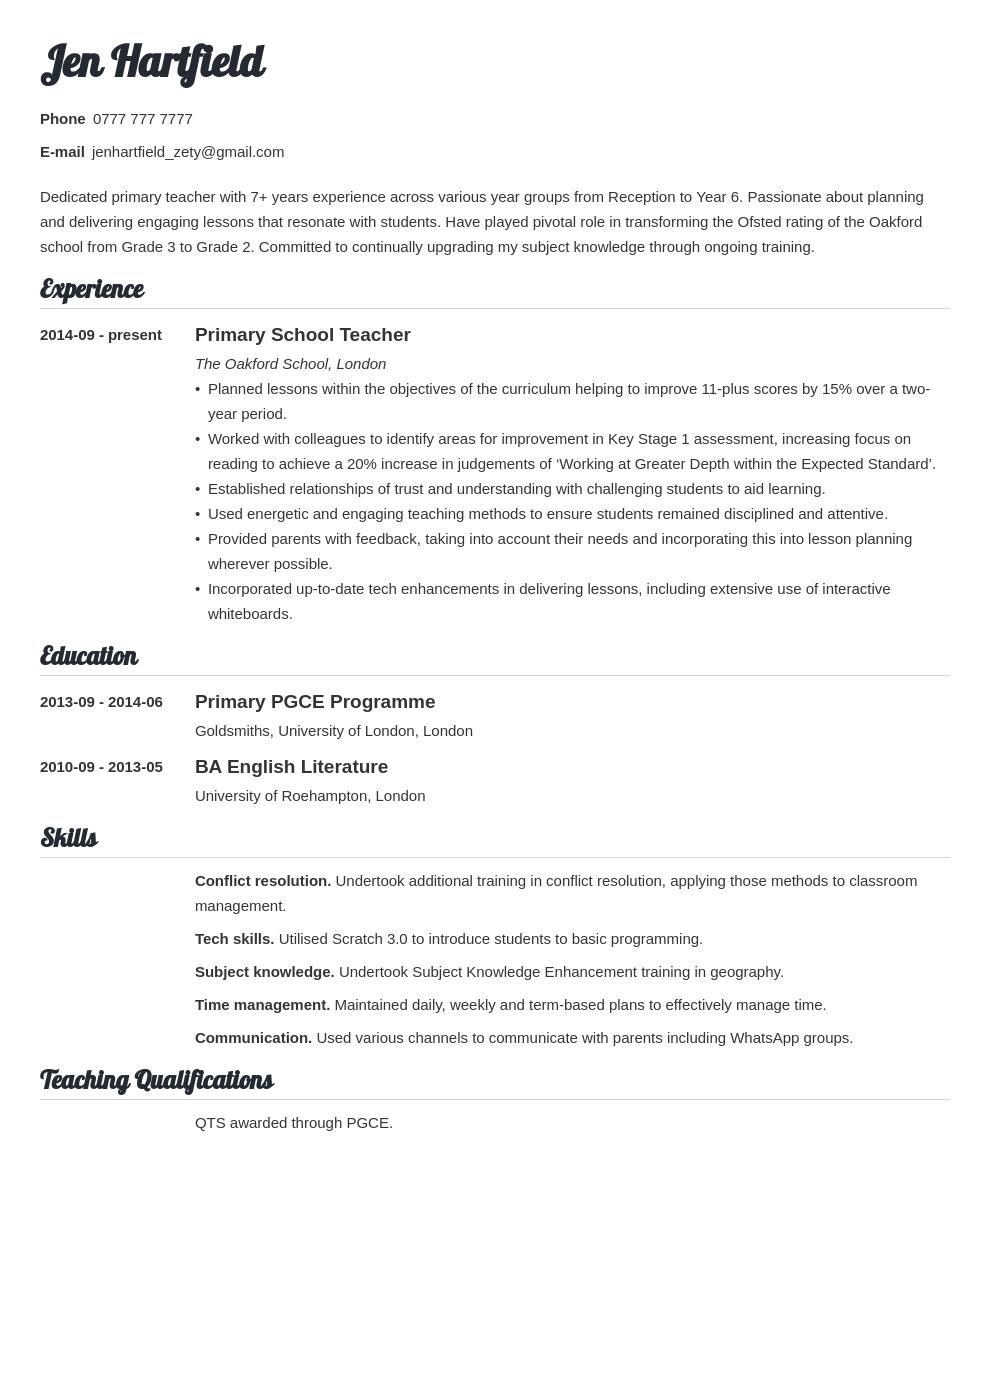 uk teacher cv example template valera in 2020 Teacher cv